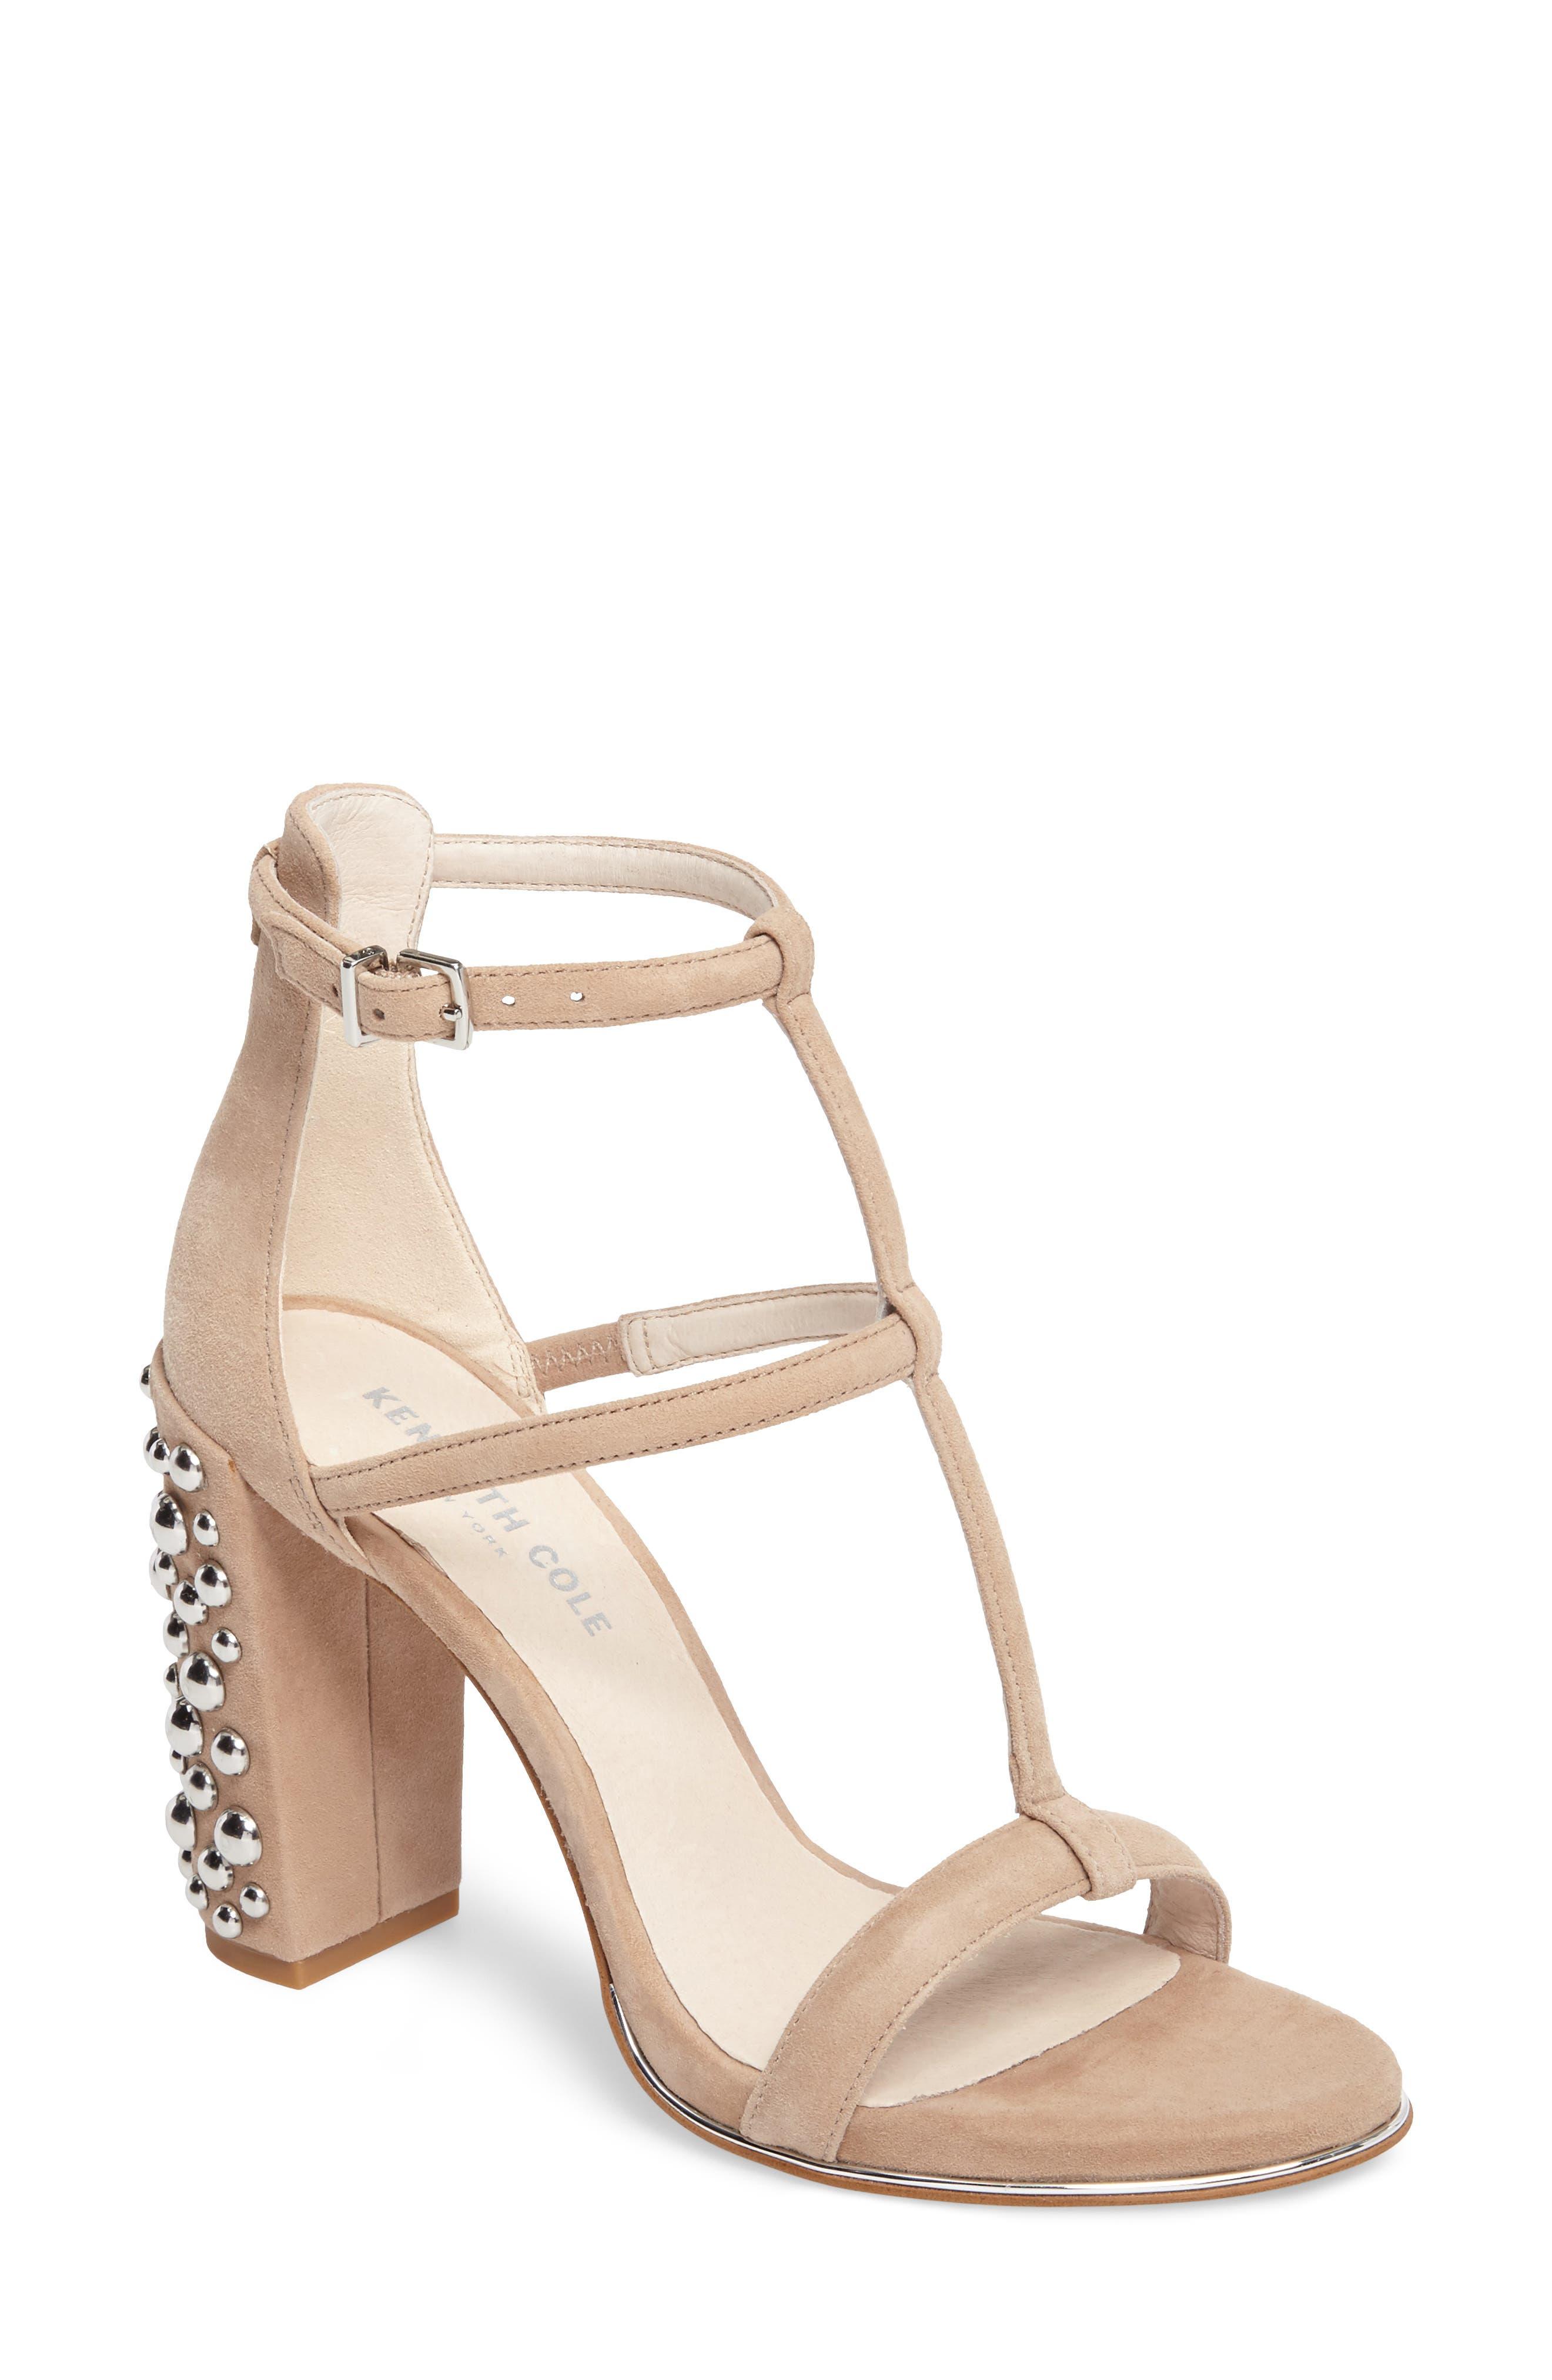 Kenneth Cole New York Deandra 2 Statement Heel Sandal (Women)